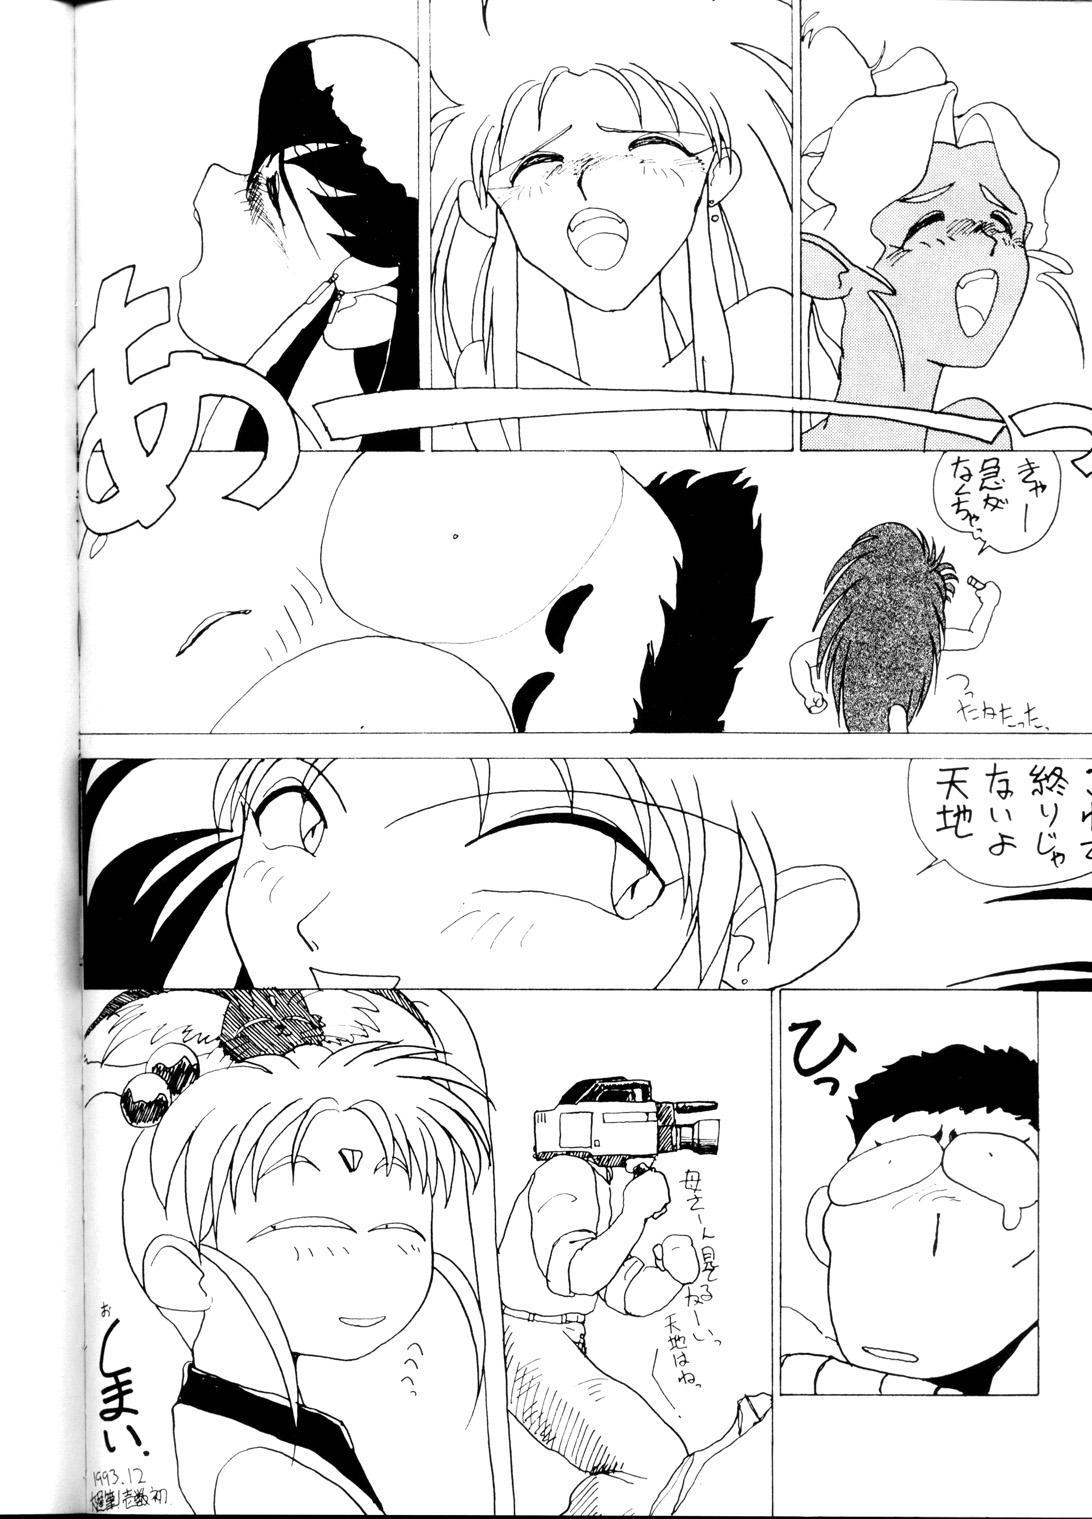 [B.B.C] Tenchi Muyou! Ryou-ou-ki Kaiteiben (Tenchi Muyou!) 76